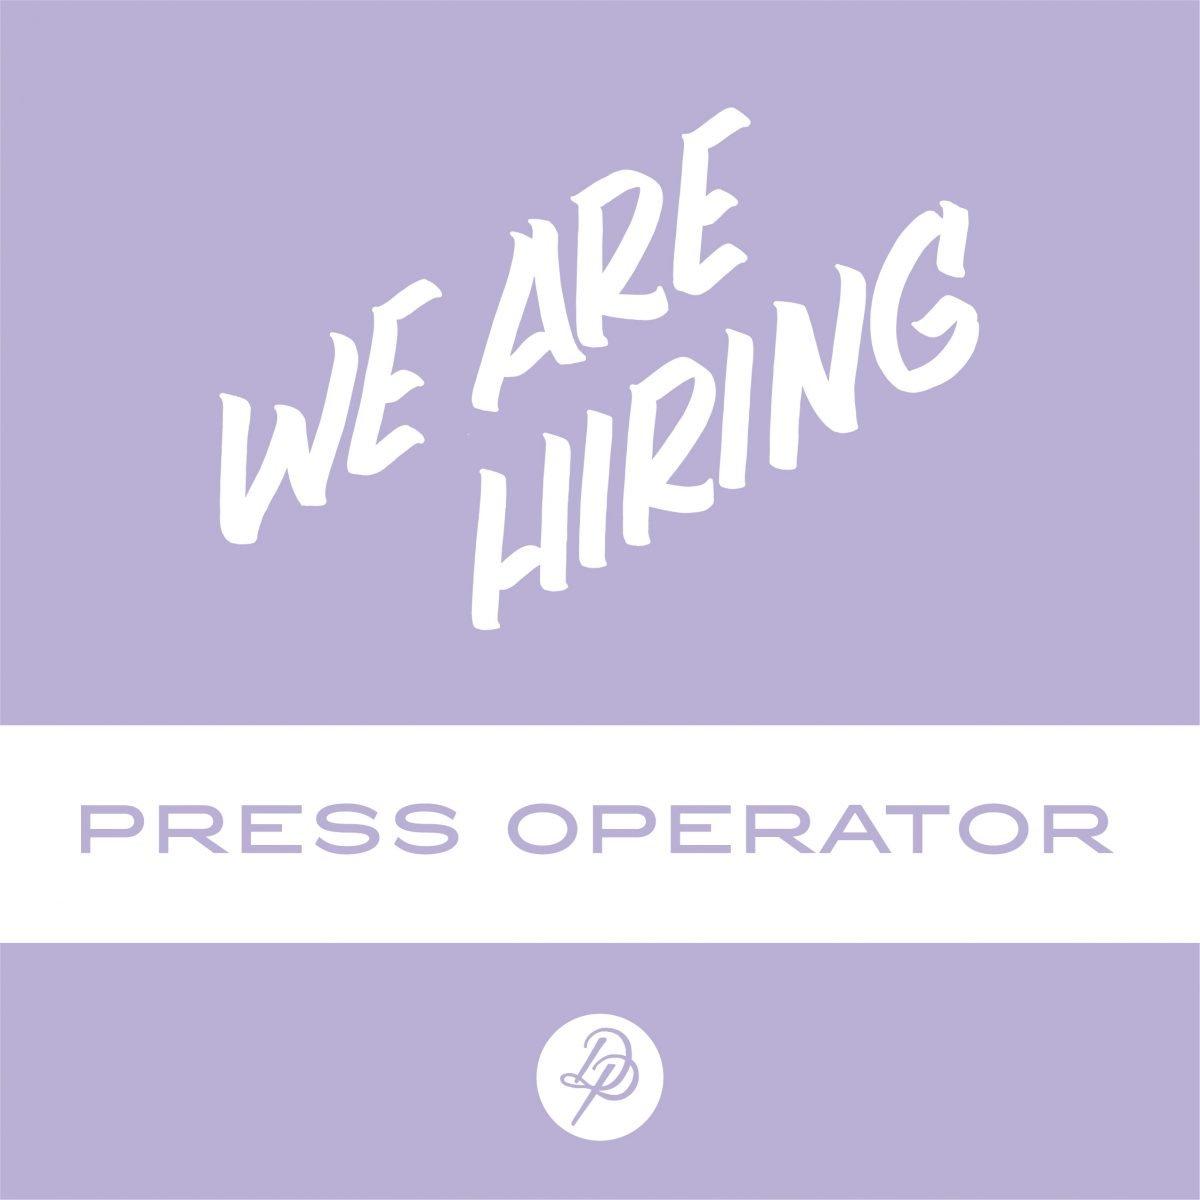 We Are Hiring Press Operator